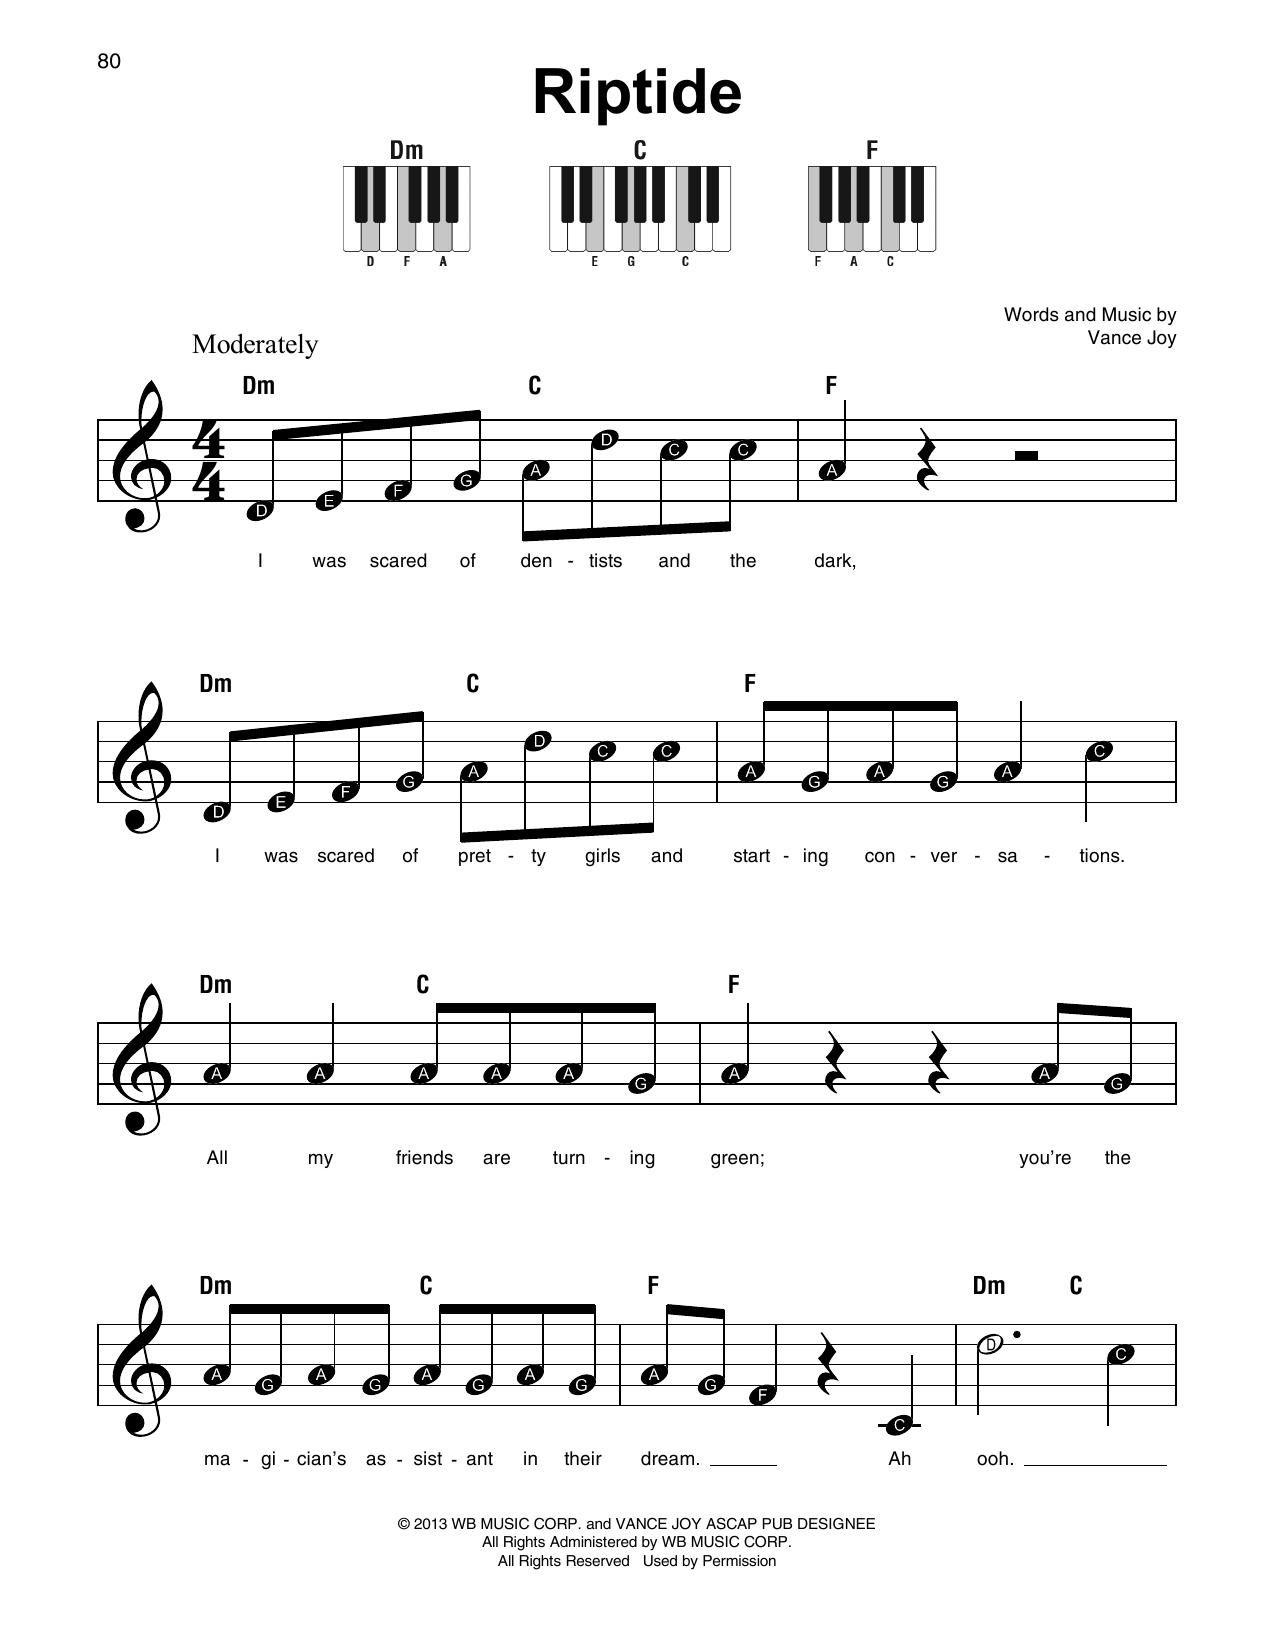 Sheet Music Digital Files To Print - Licensed Rock Digital